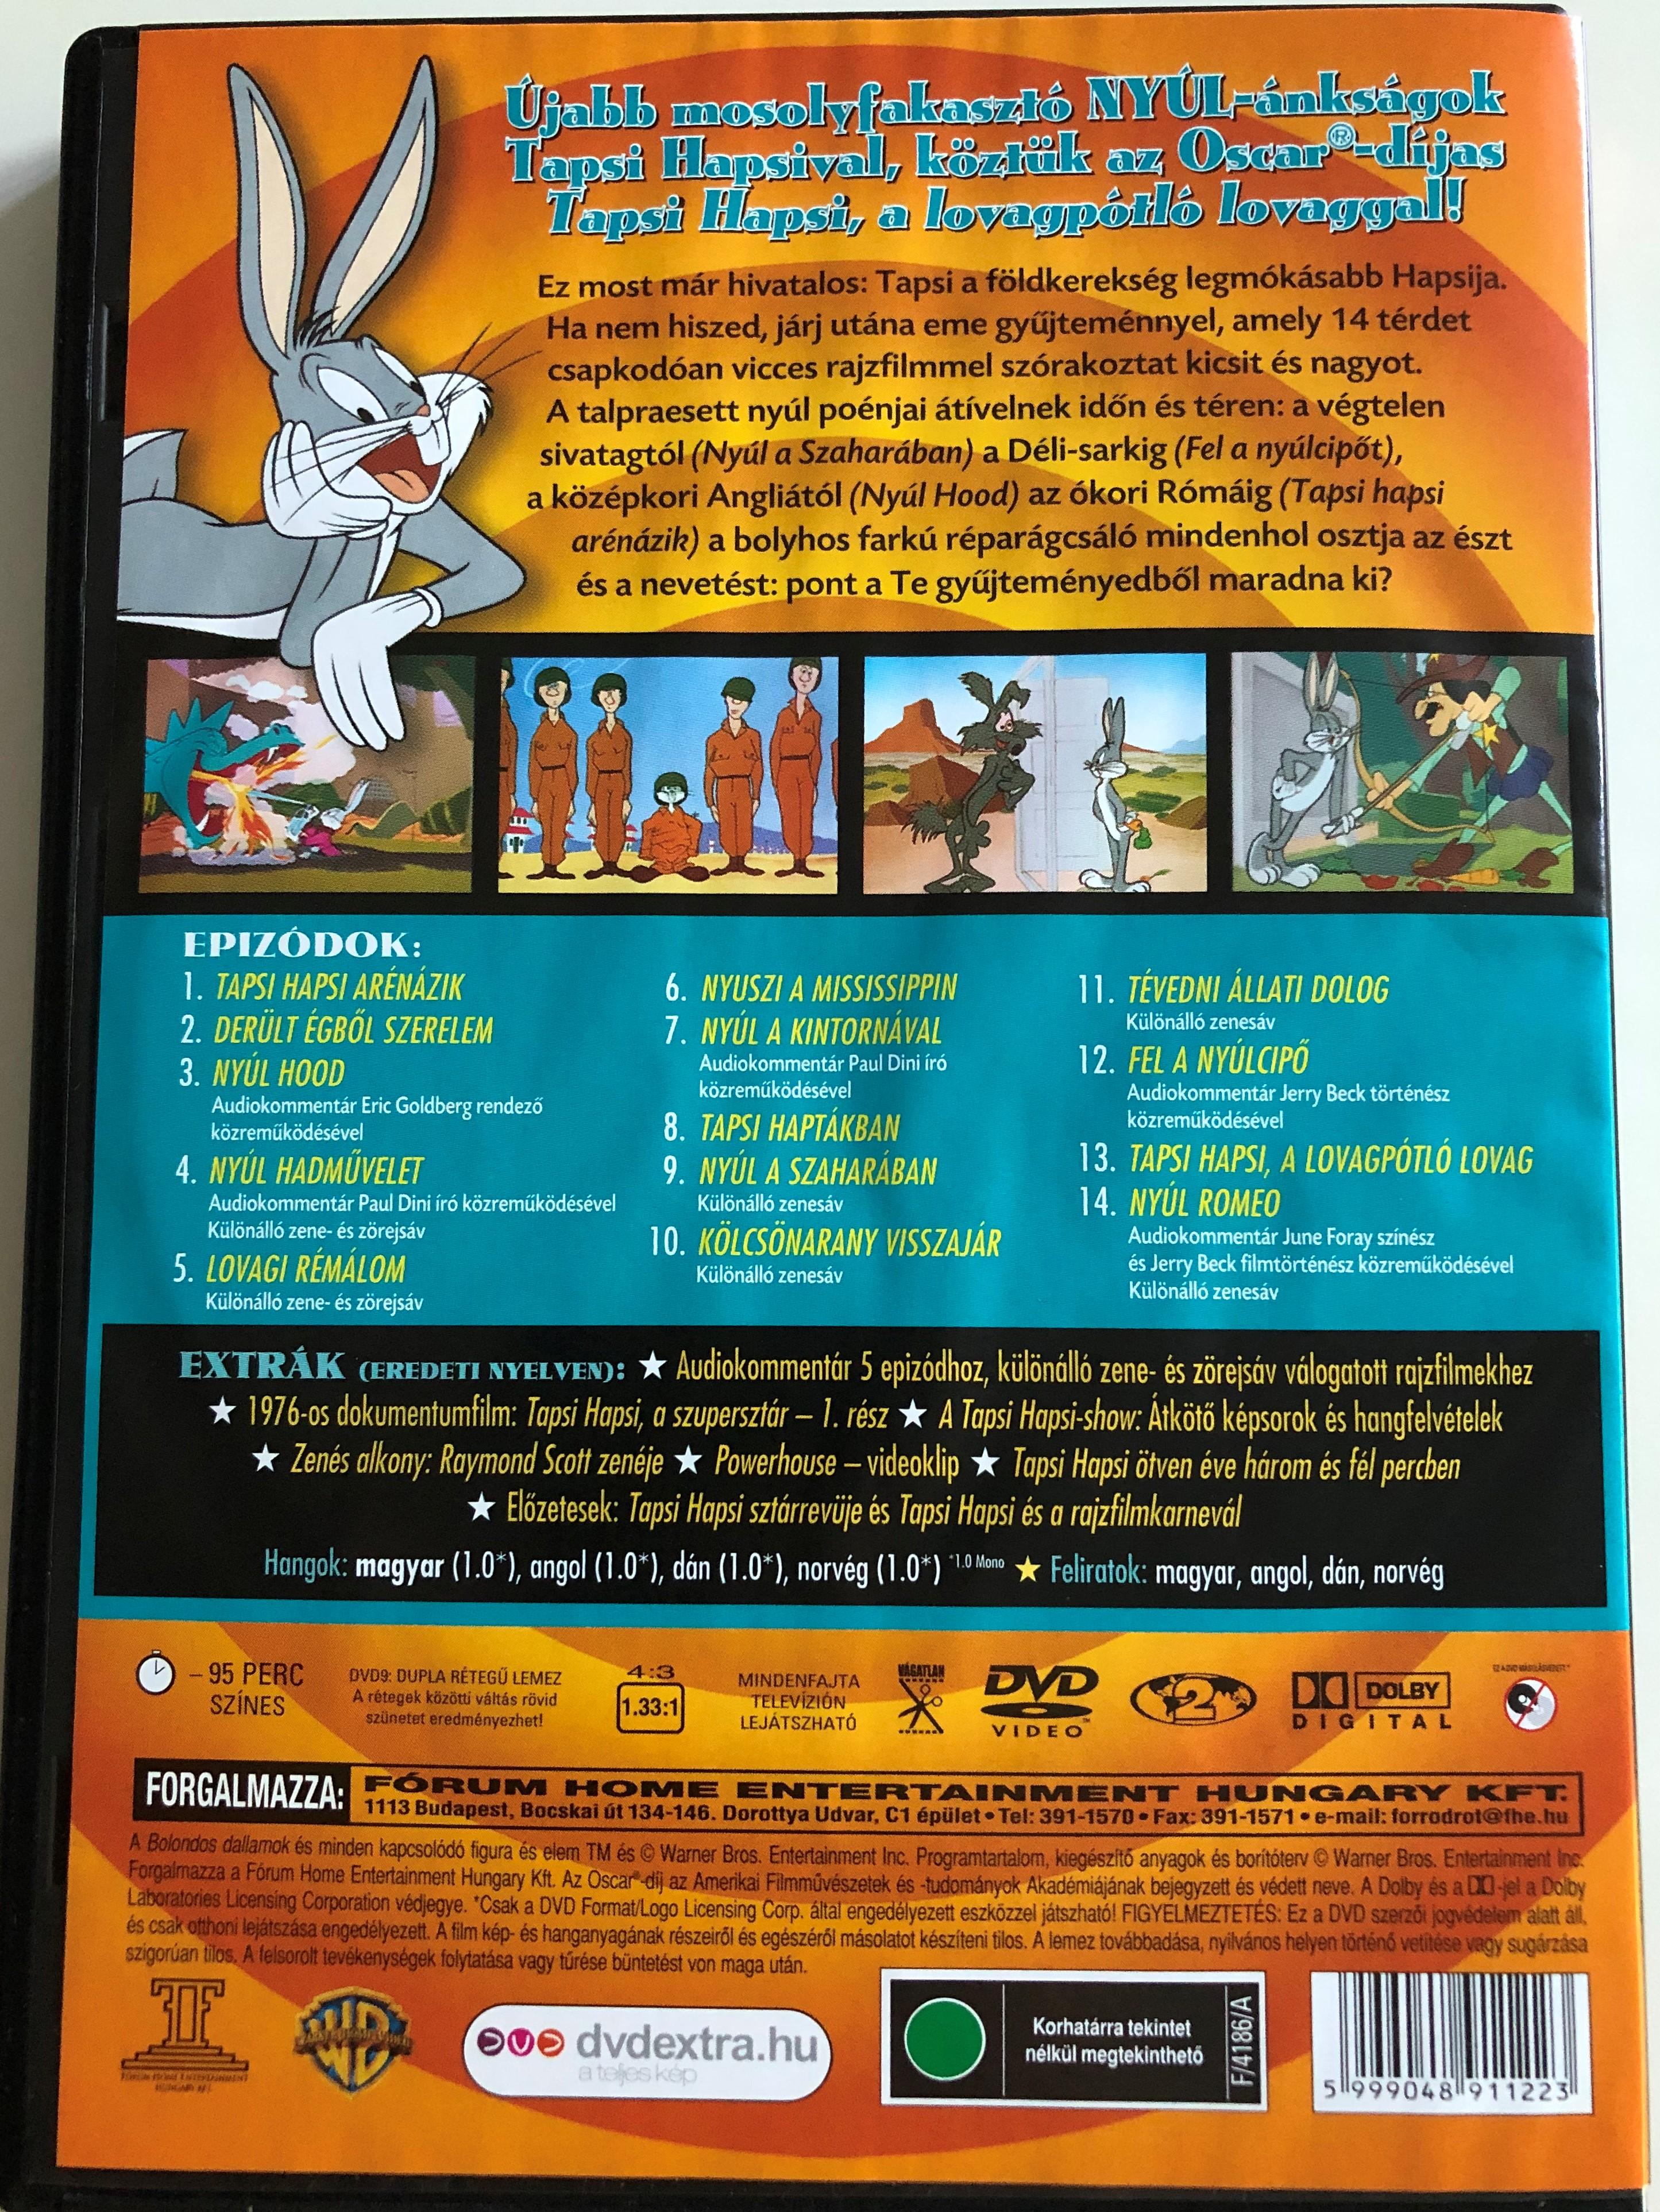 best-of-bugs-bunny-volume-4-dvd-2006-tapsi-hapsi-gy-jtem-nye-4.-directed-by-friz-freleng-robert-mckimson-chuck-jones-14-episodes-on-disc-2-.jpg